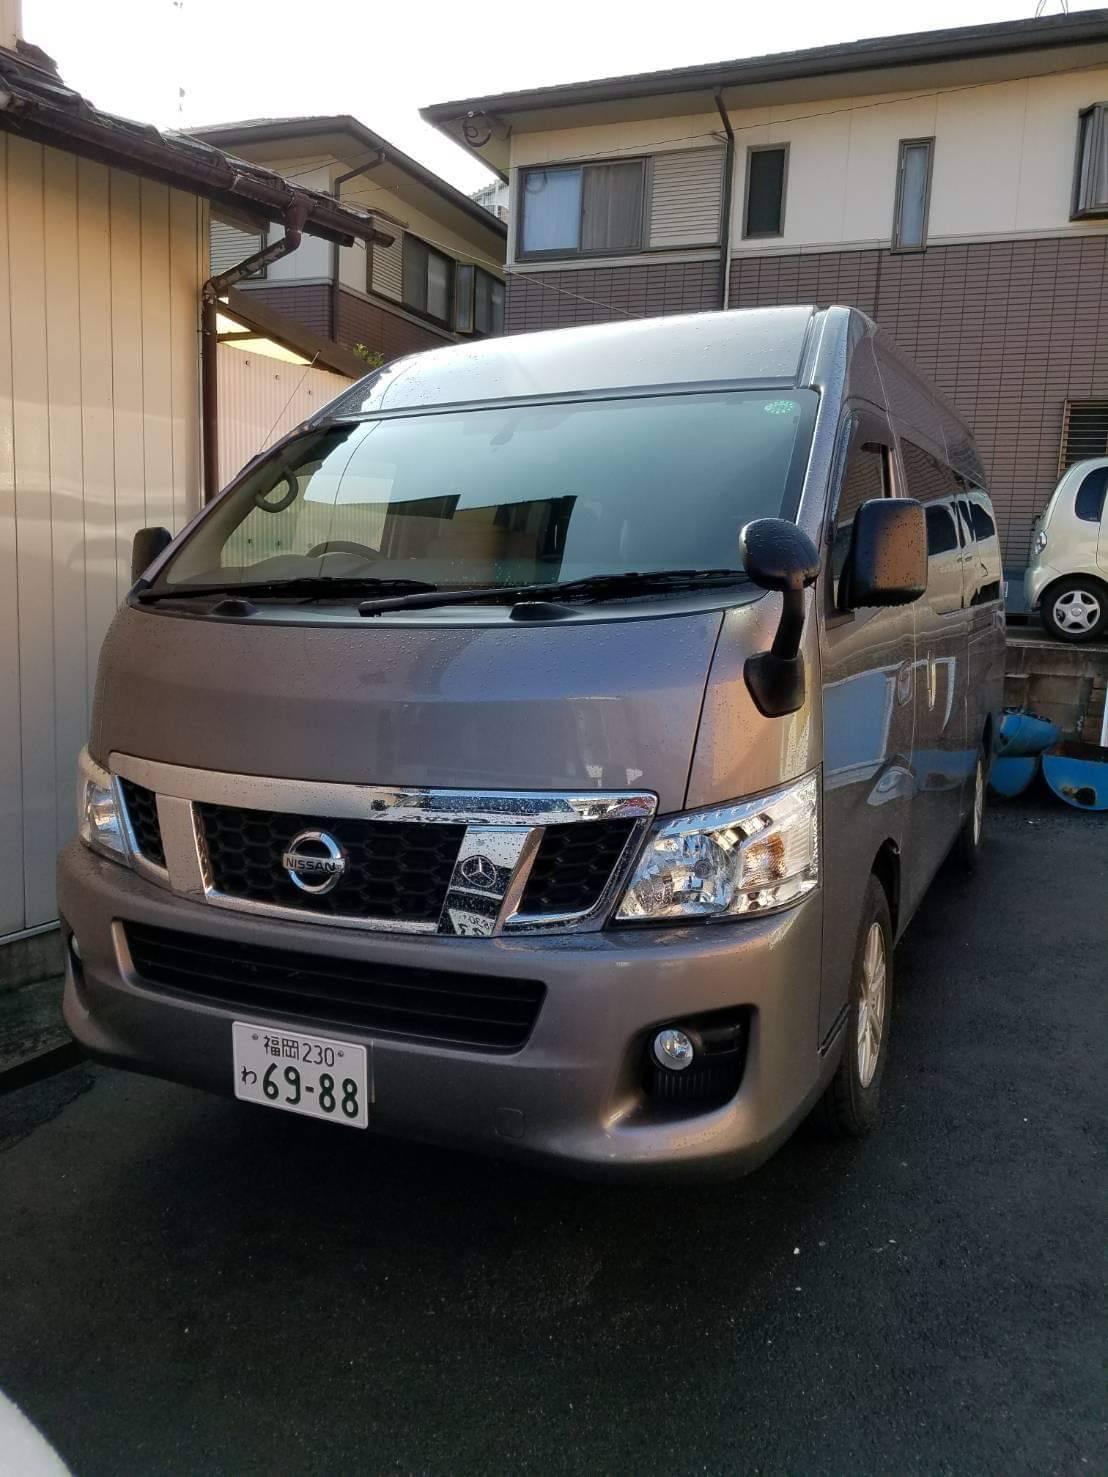 http://rental-campingcar.com/blog/65377.jpg